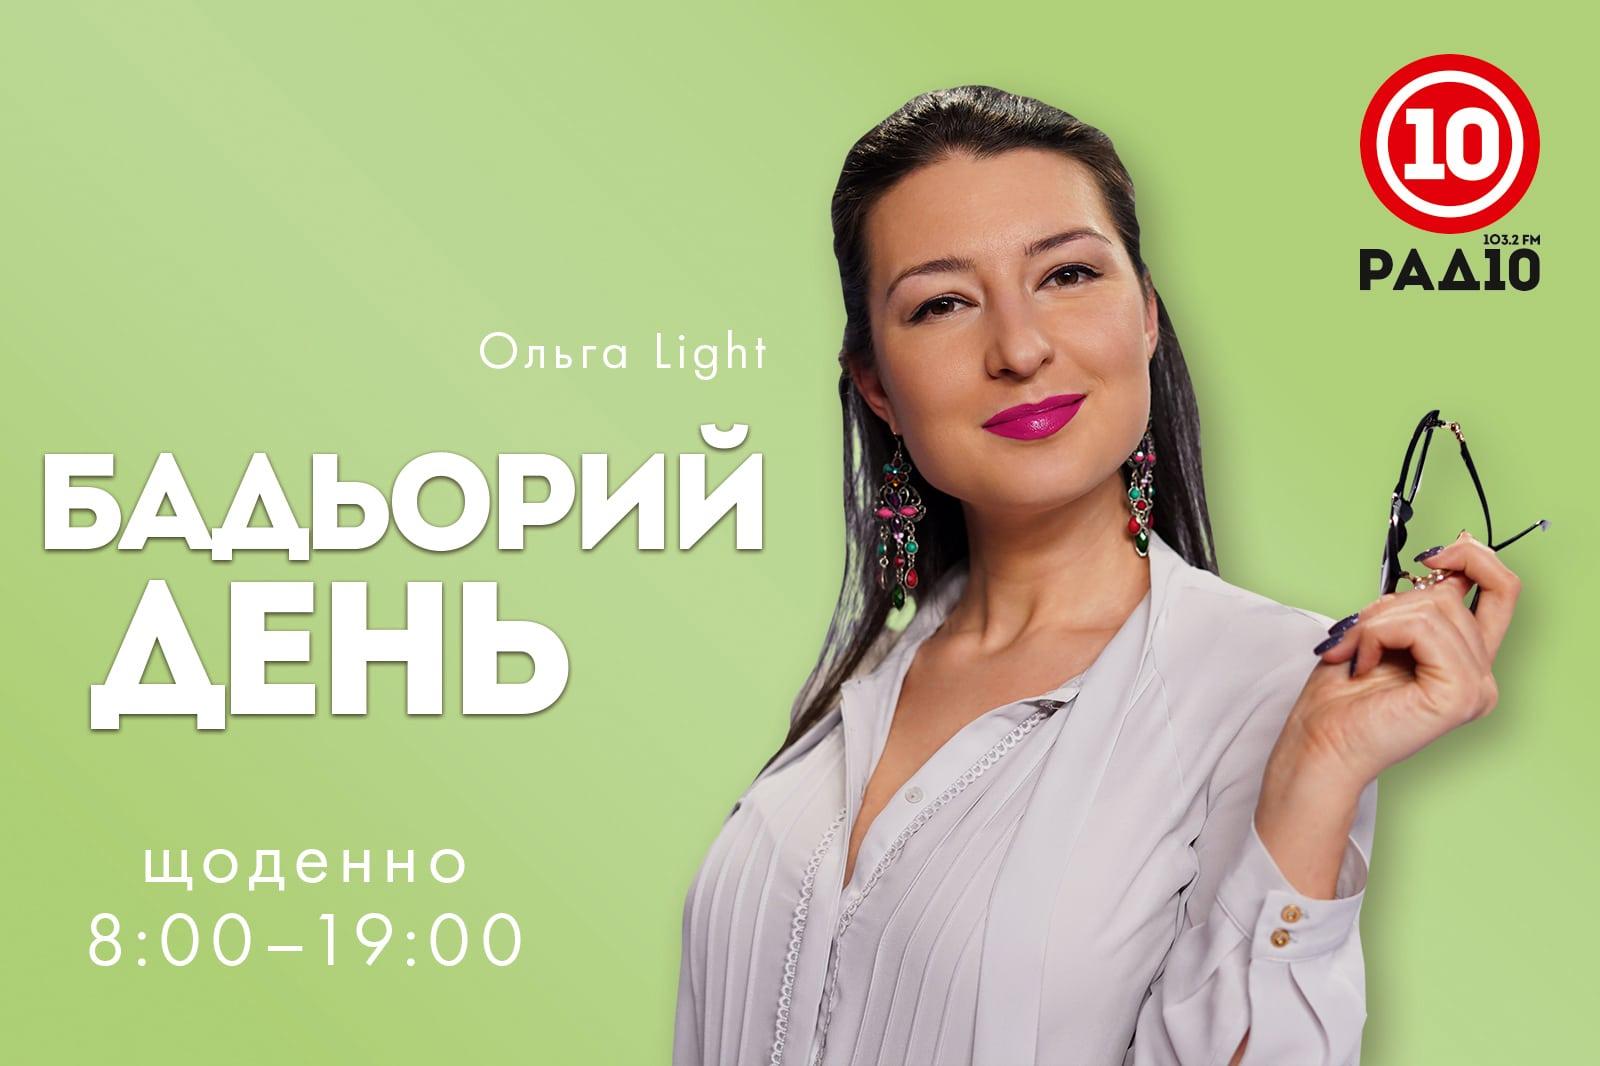 «Бадьорий День» з Ольгою Light